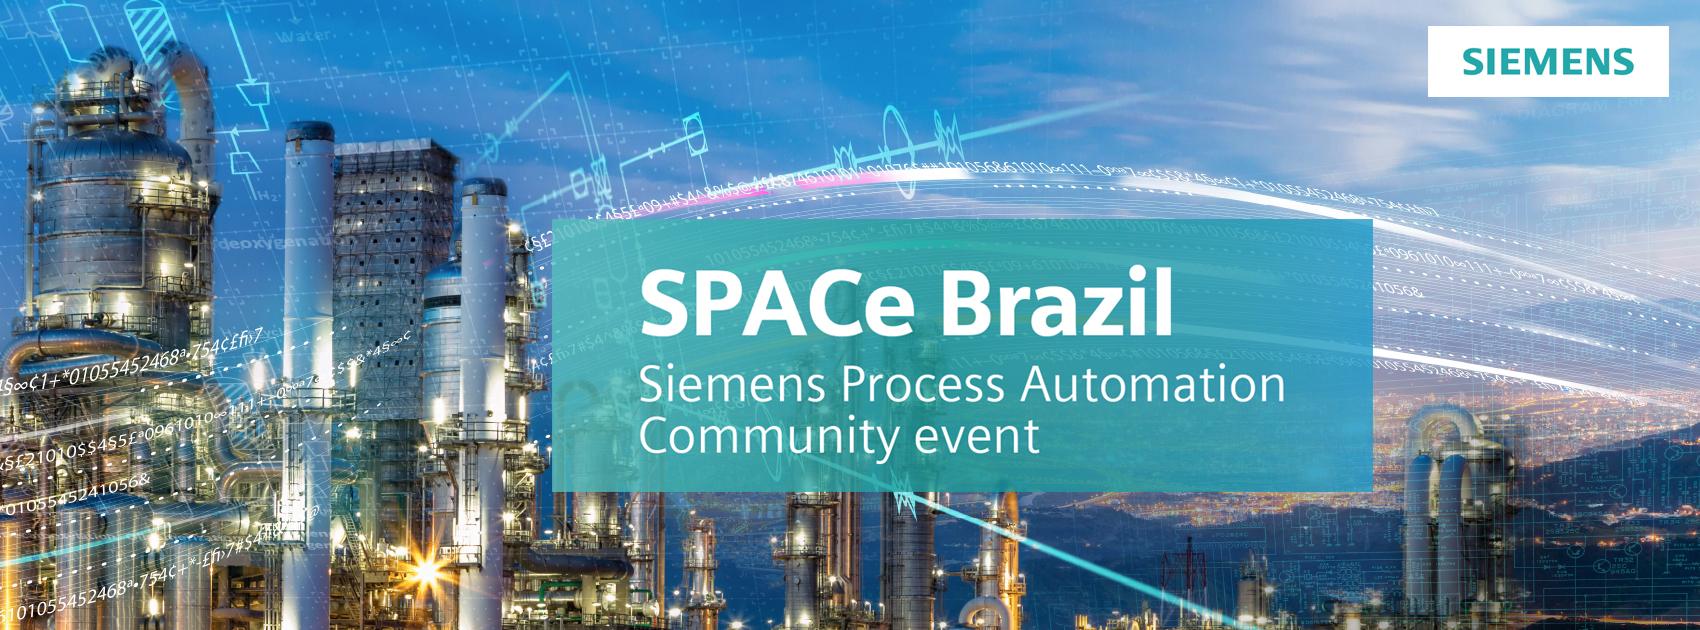 Siemens promove edição online do SPACe Brazil 2021